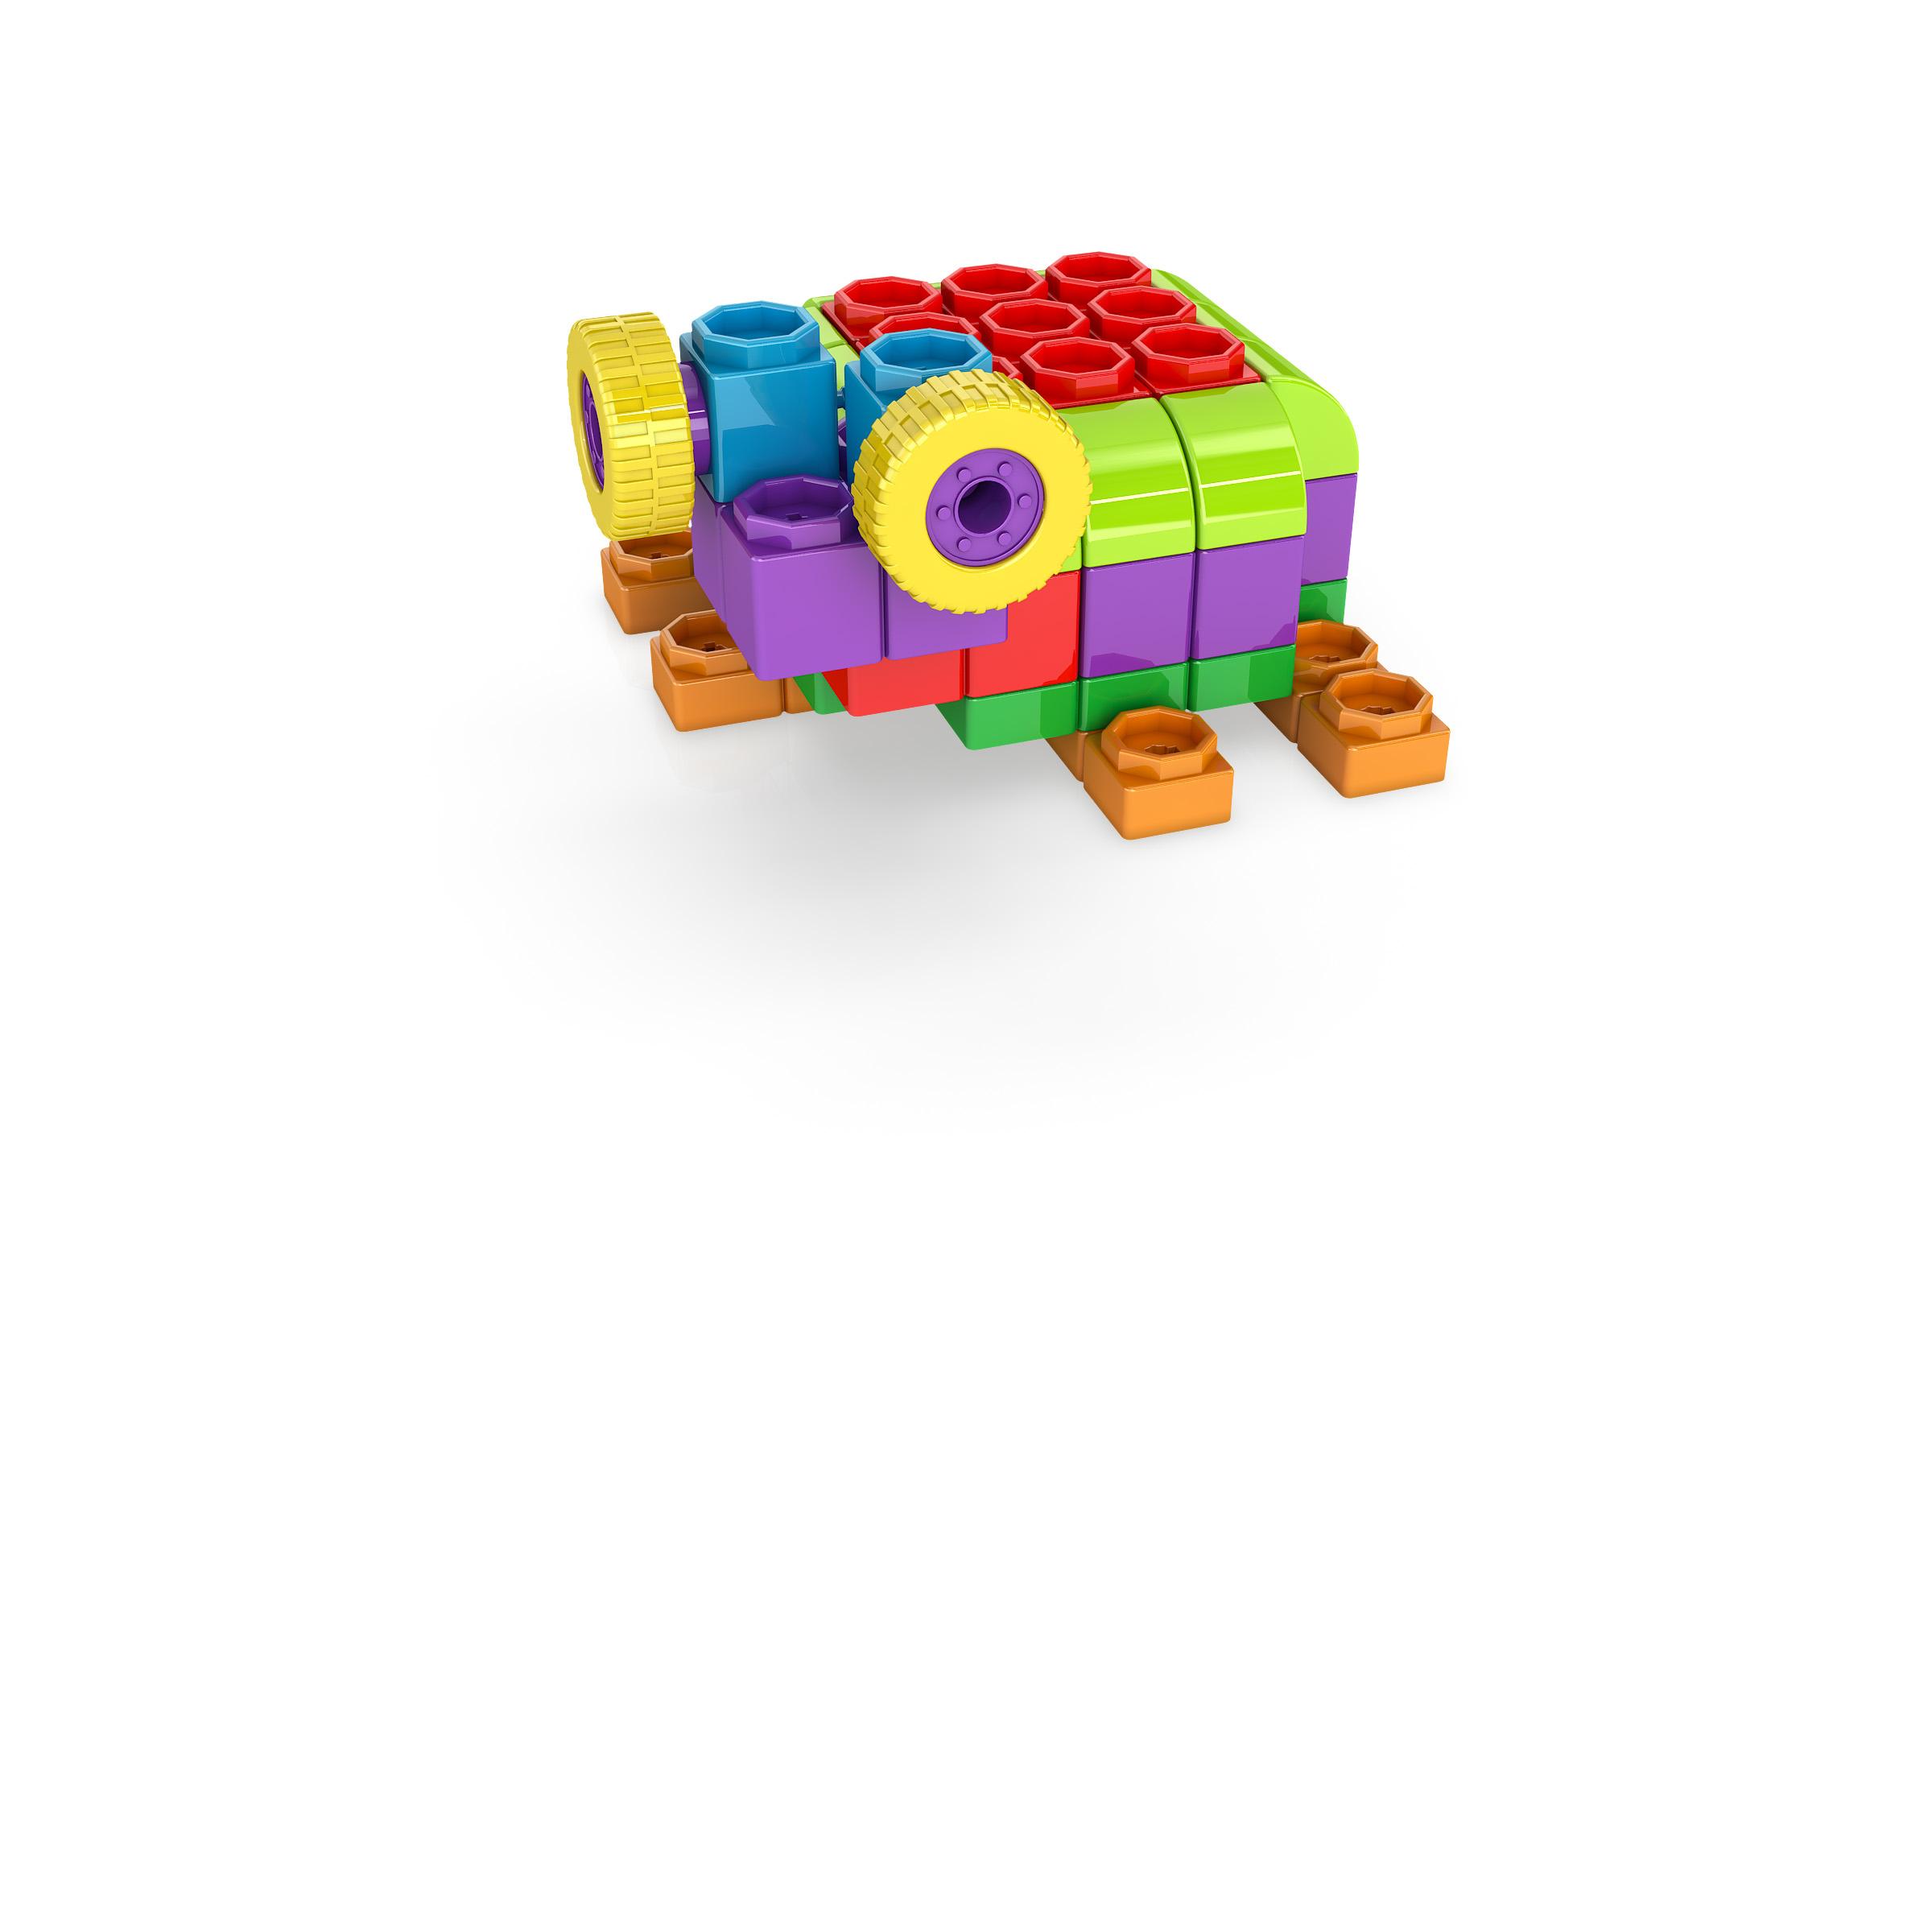 , TURTLE, משחקי חשיבה לילדים engino, משחקים לגיל הרך playgro, משחק הרכבות אנג'ינו, משחקי רכבות